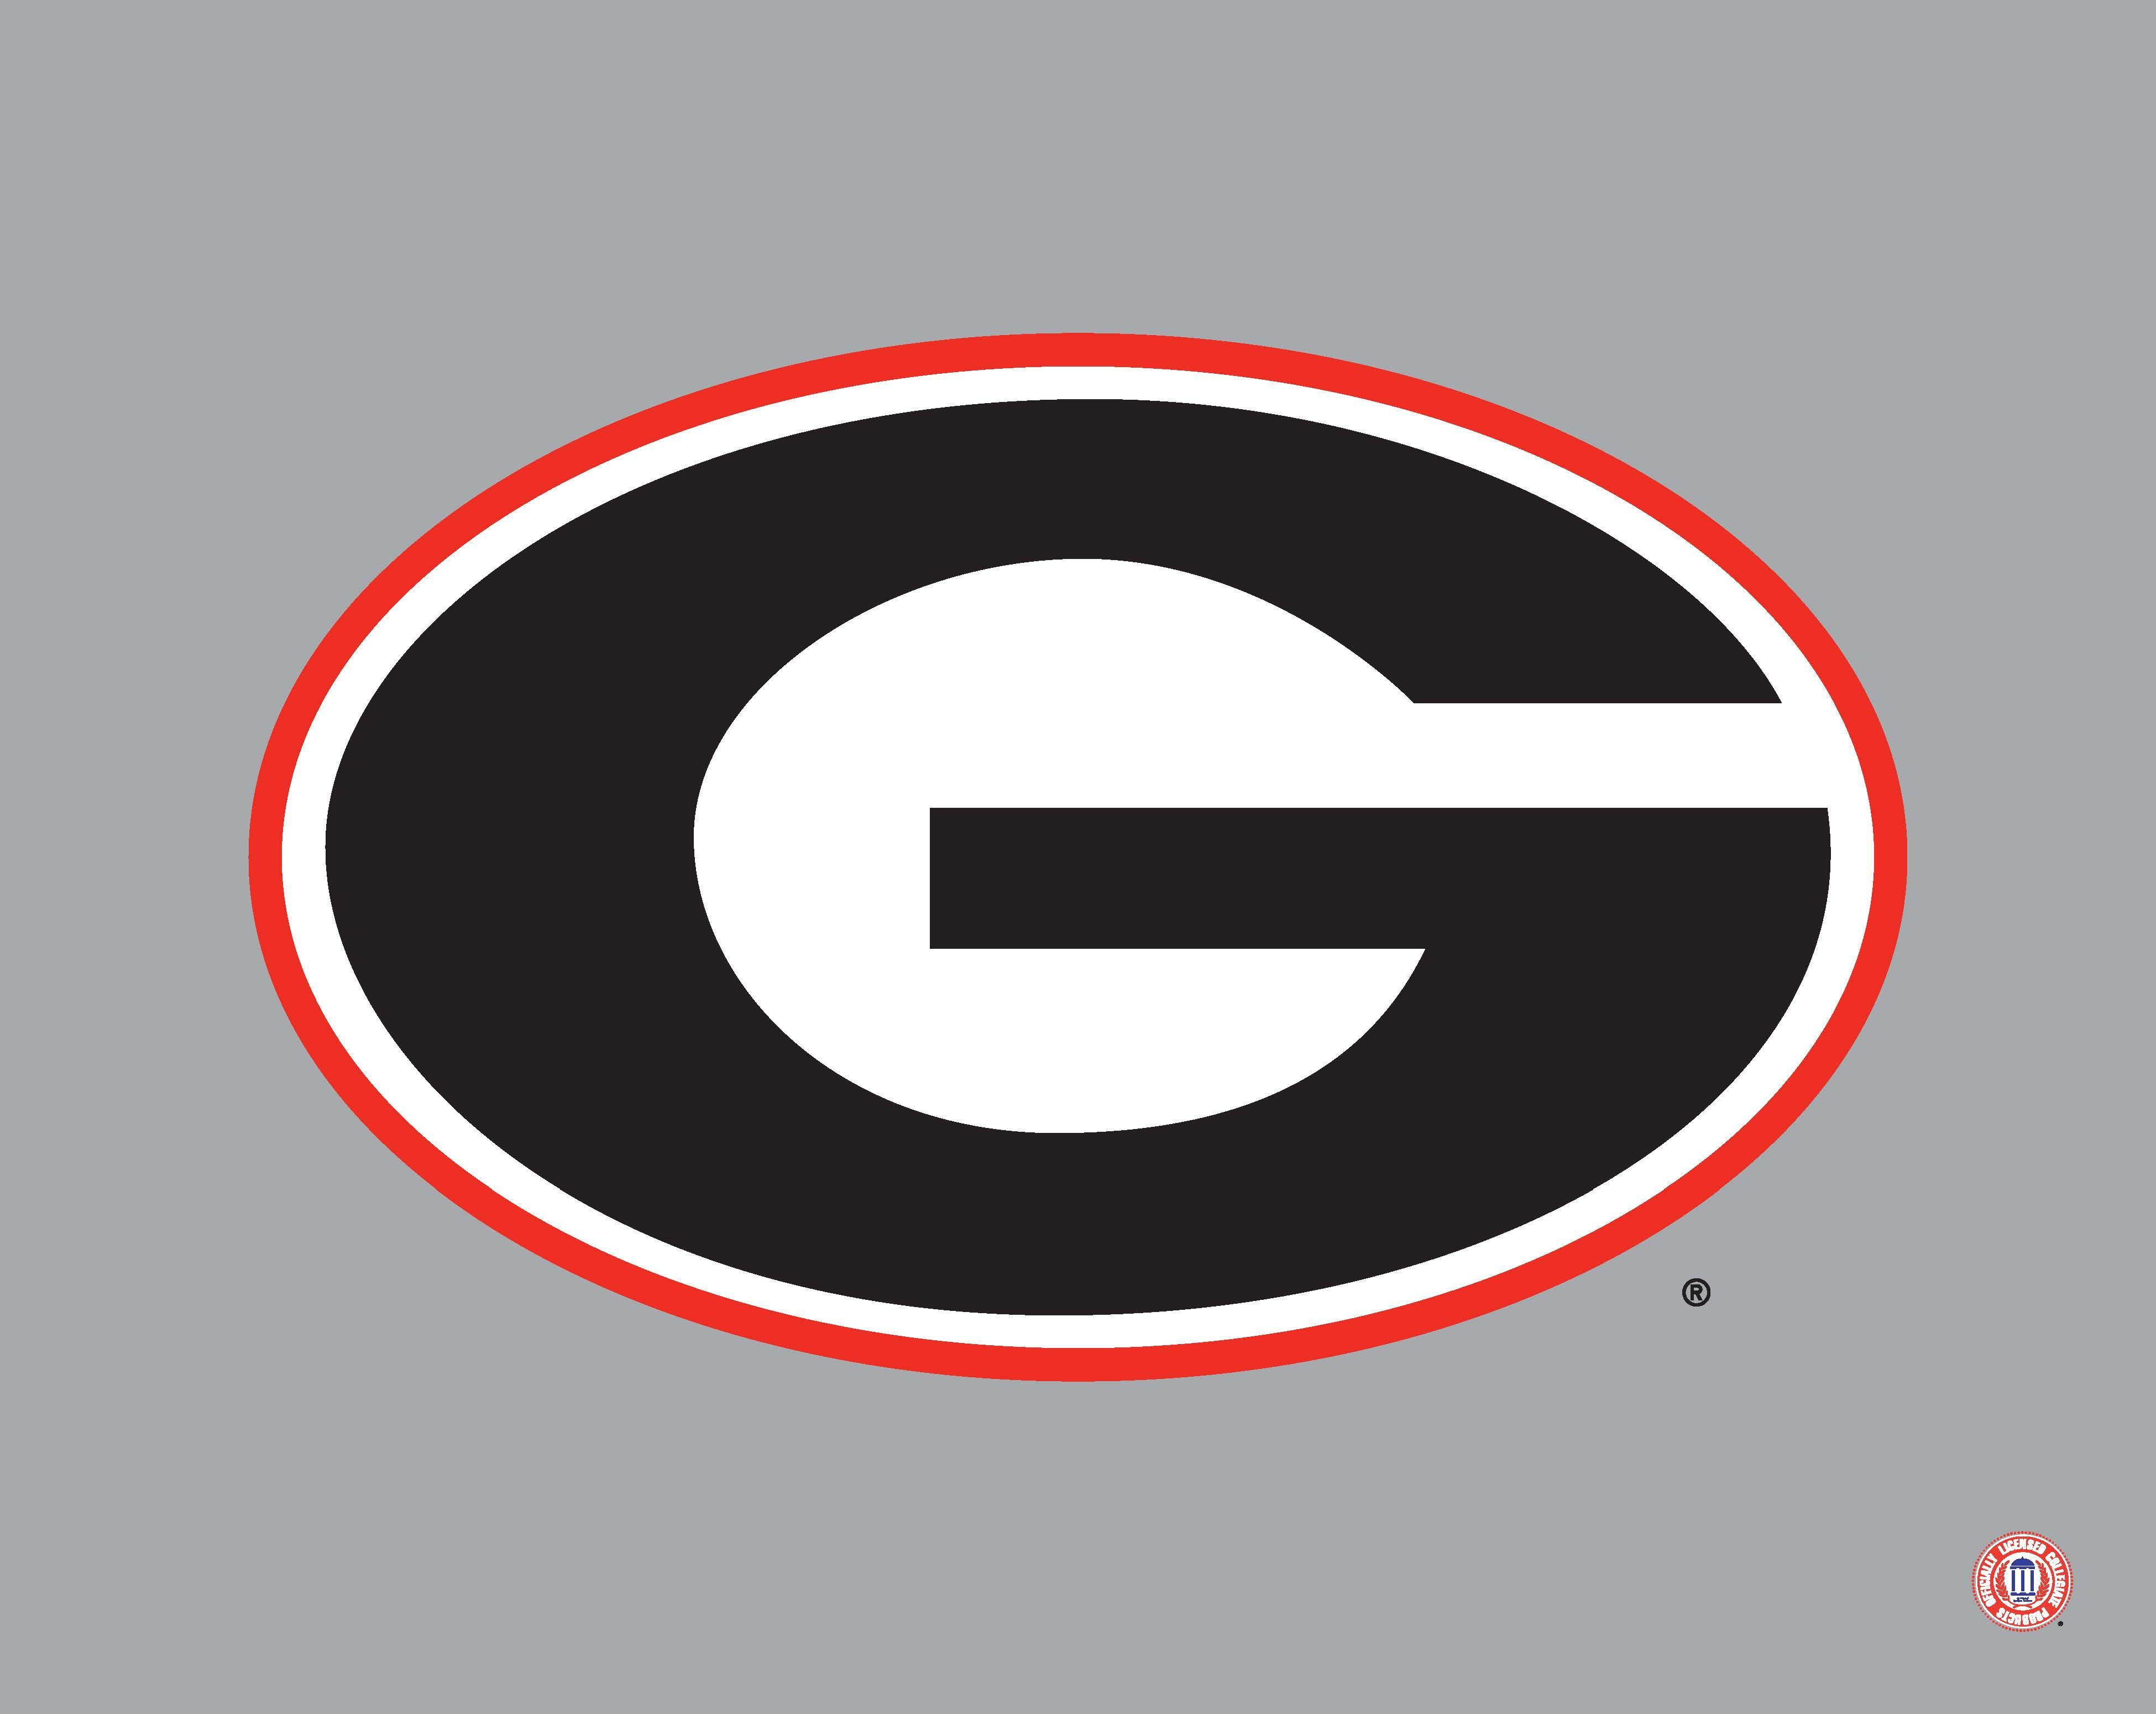 small resolution of georgia bulldogs logo